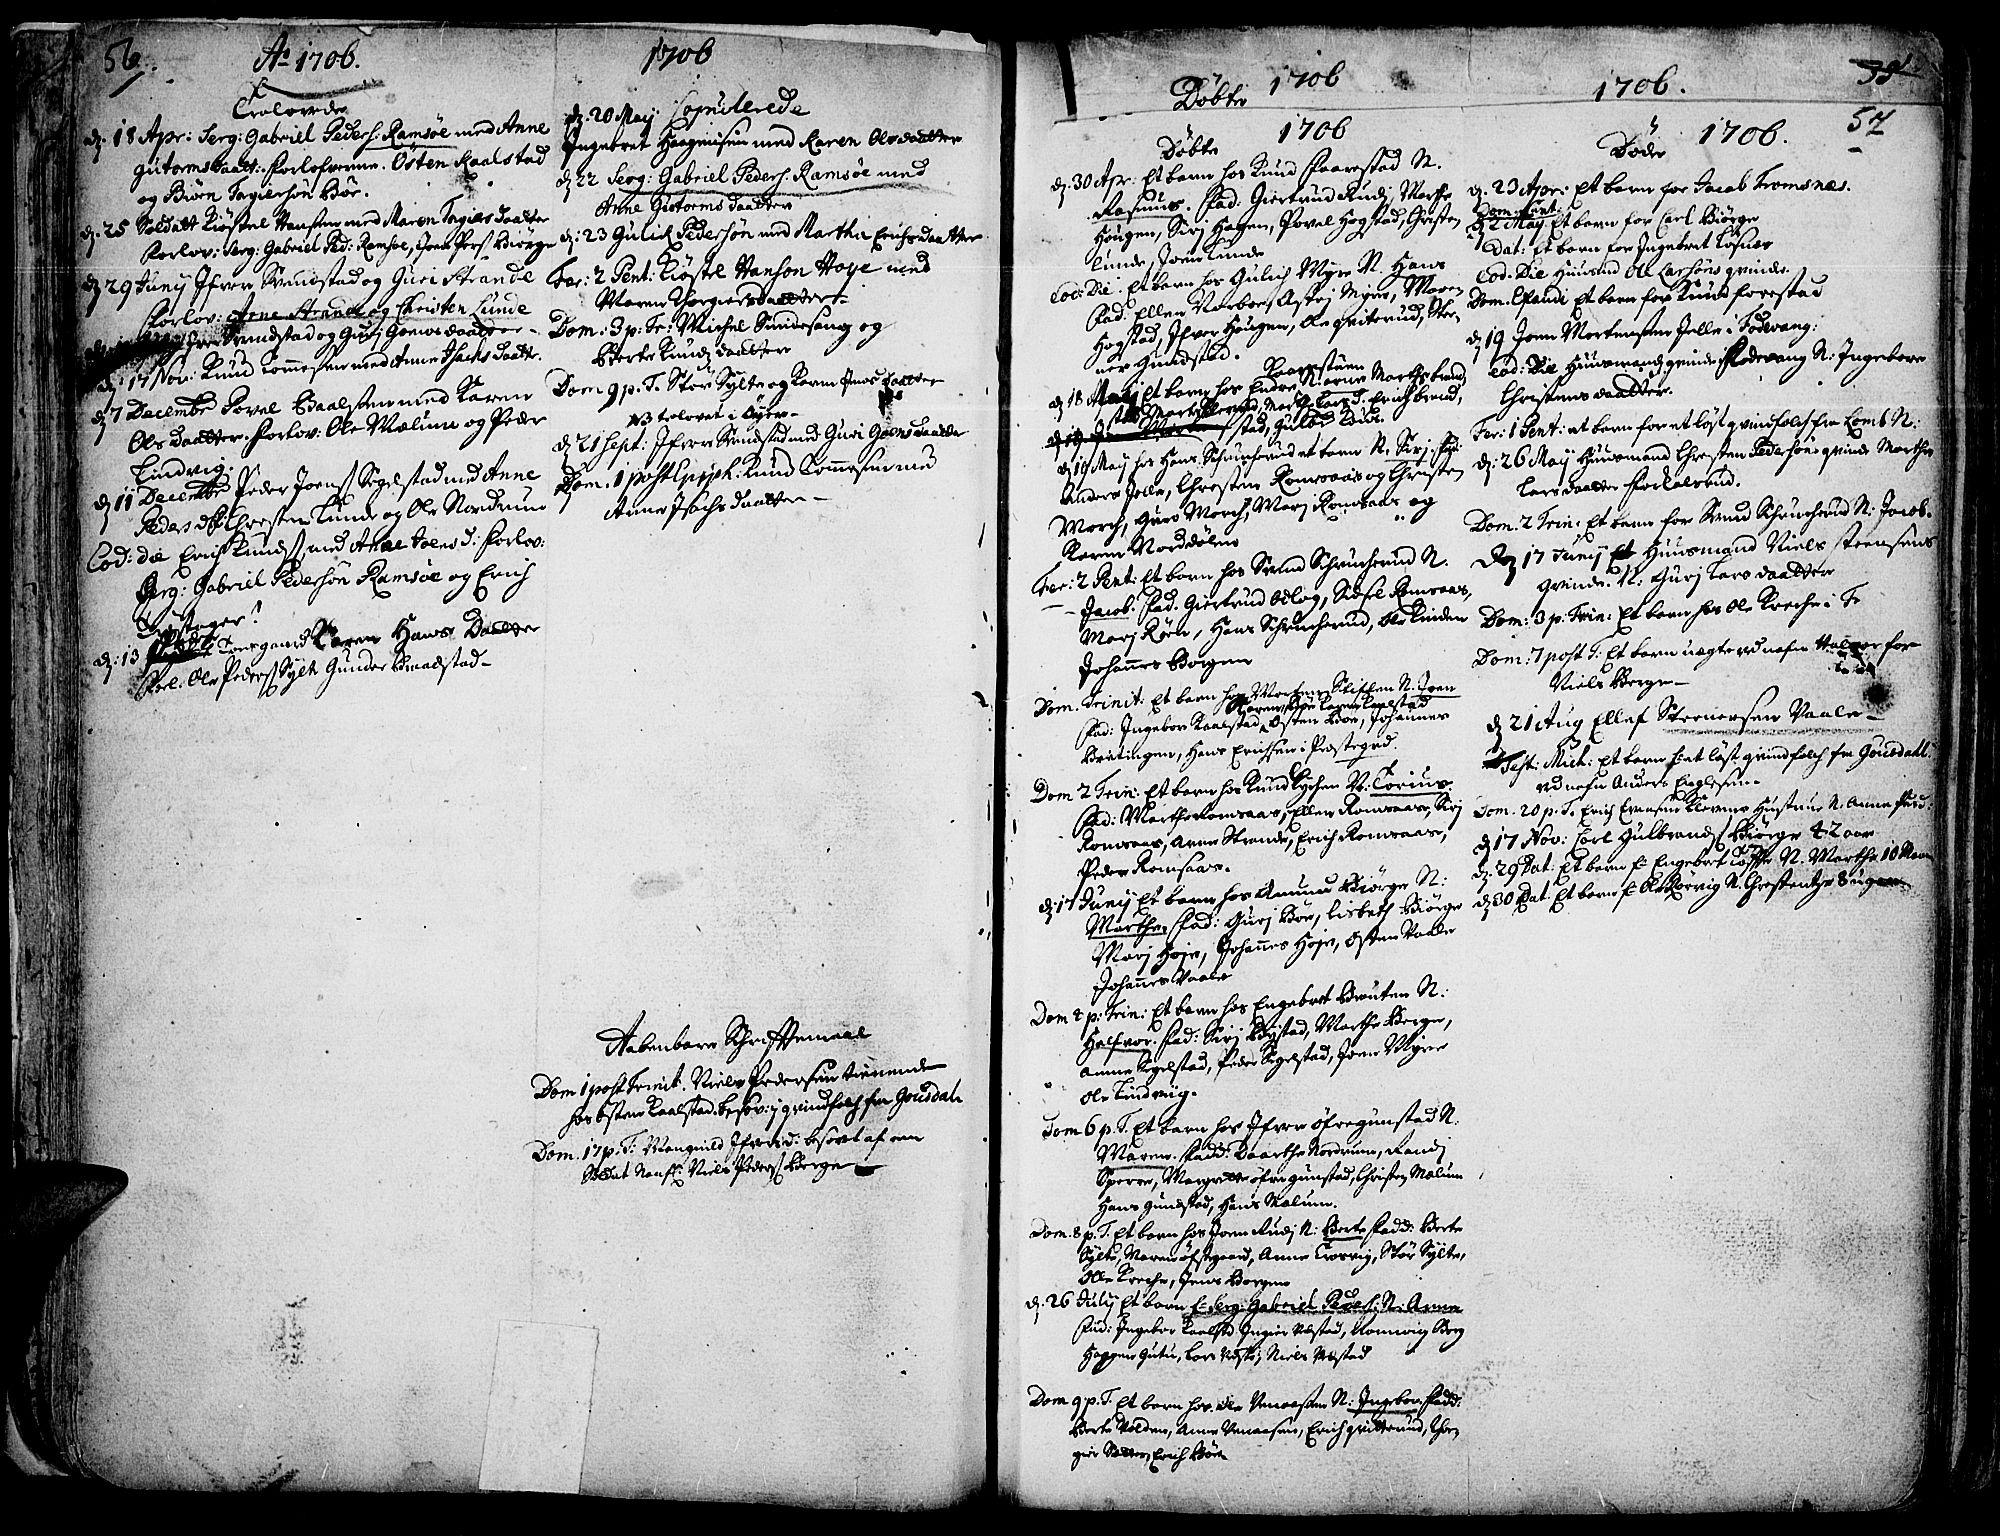 SAH, Ringebu prestekontor, Ministerialbok nr. 1, 1696-1733, s. 56-57